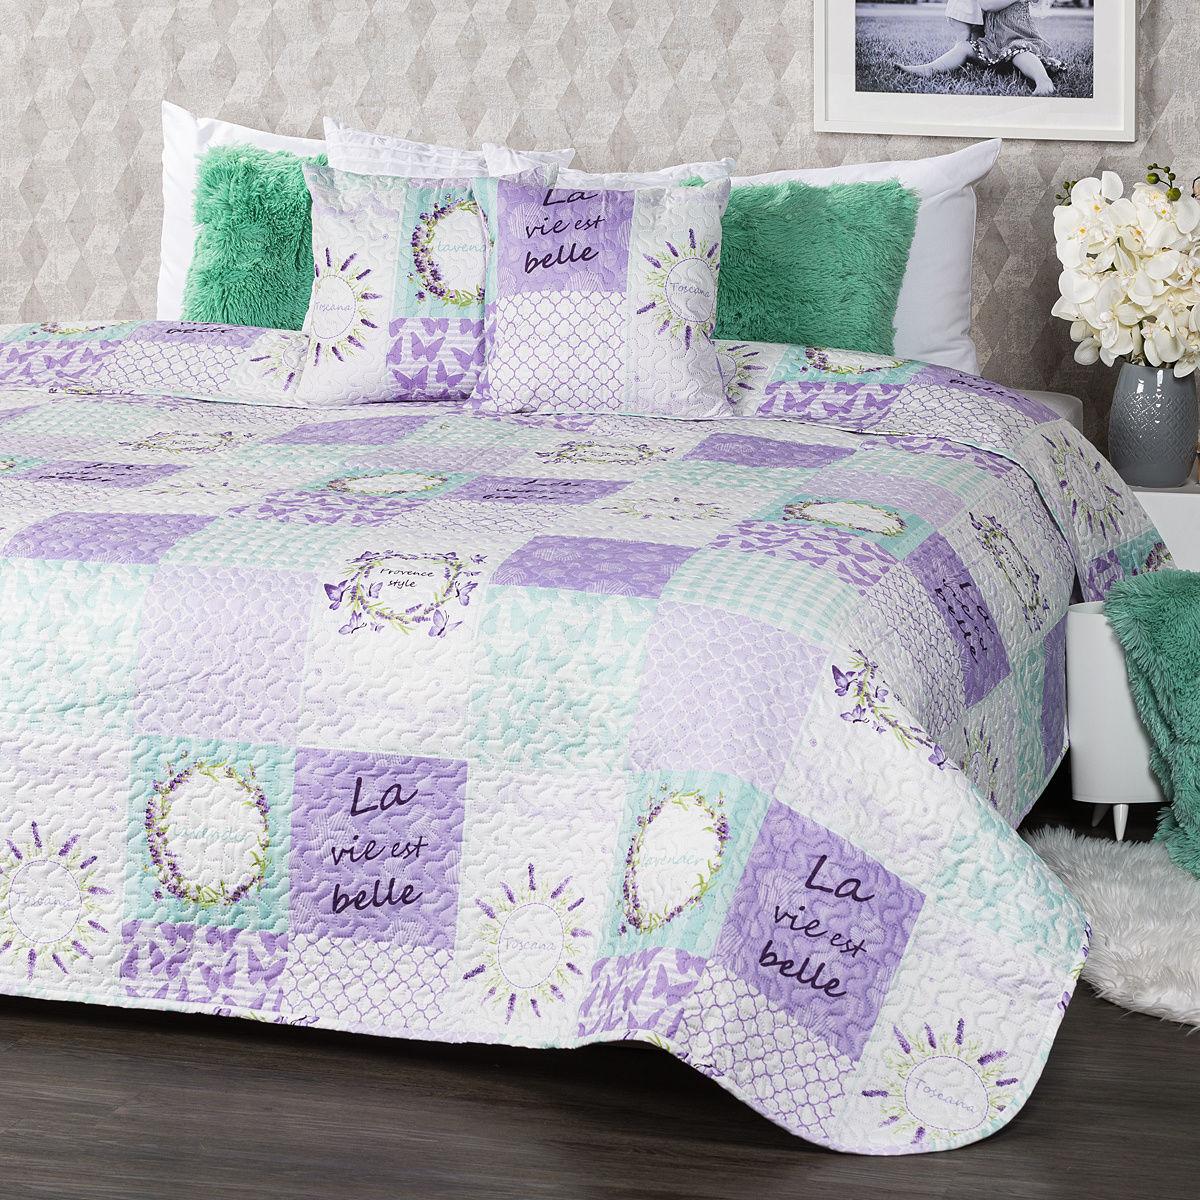 4Home Narzuta na łóżko Lavender, 220 x 240 cm, 2 szt. 40 x 40 cm